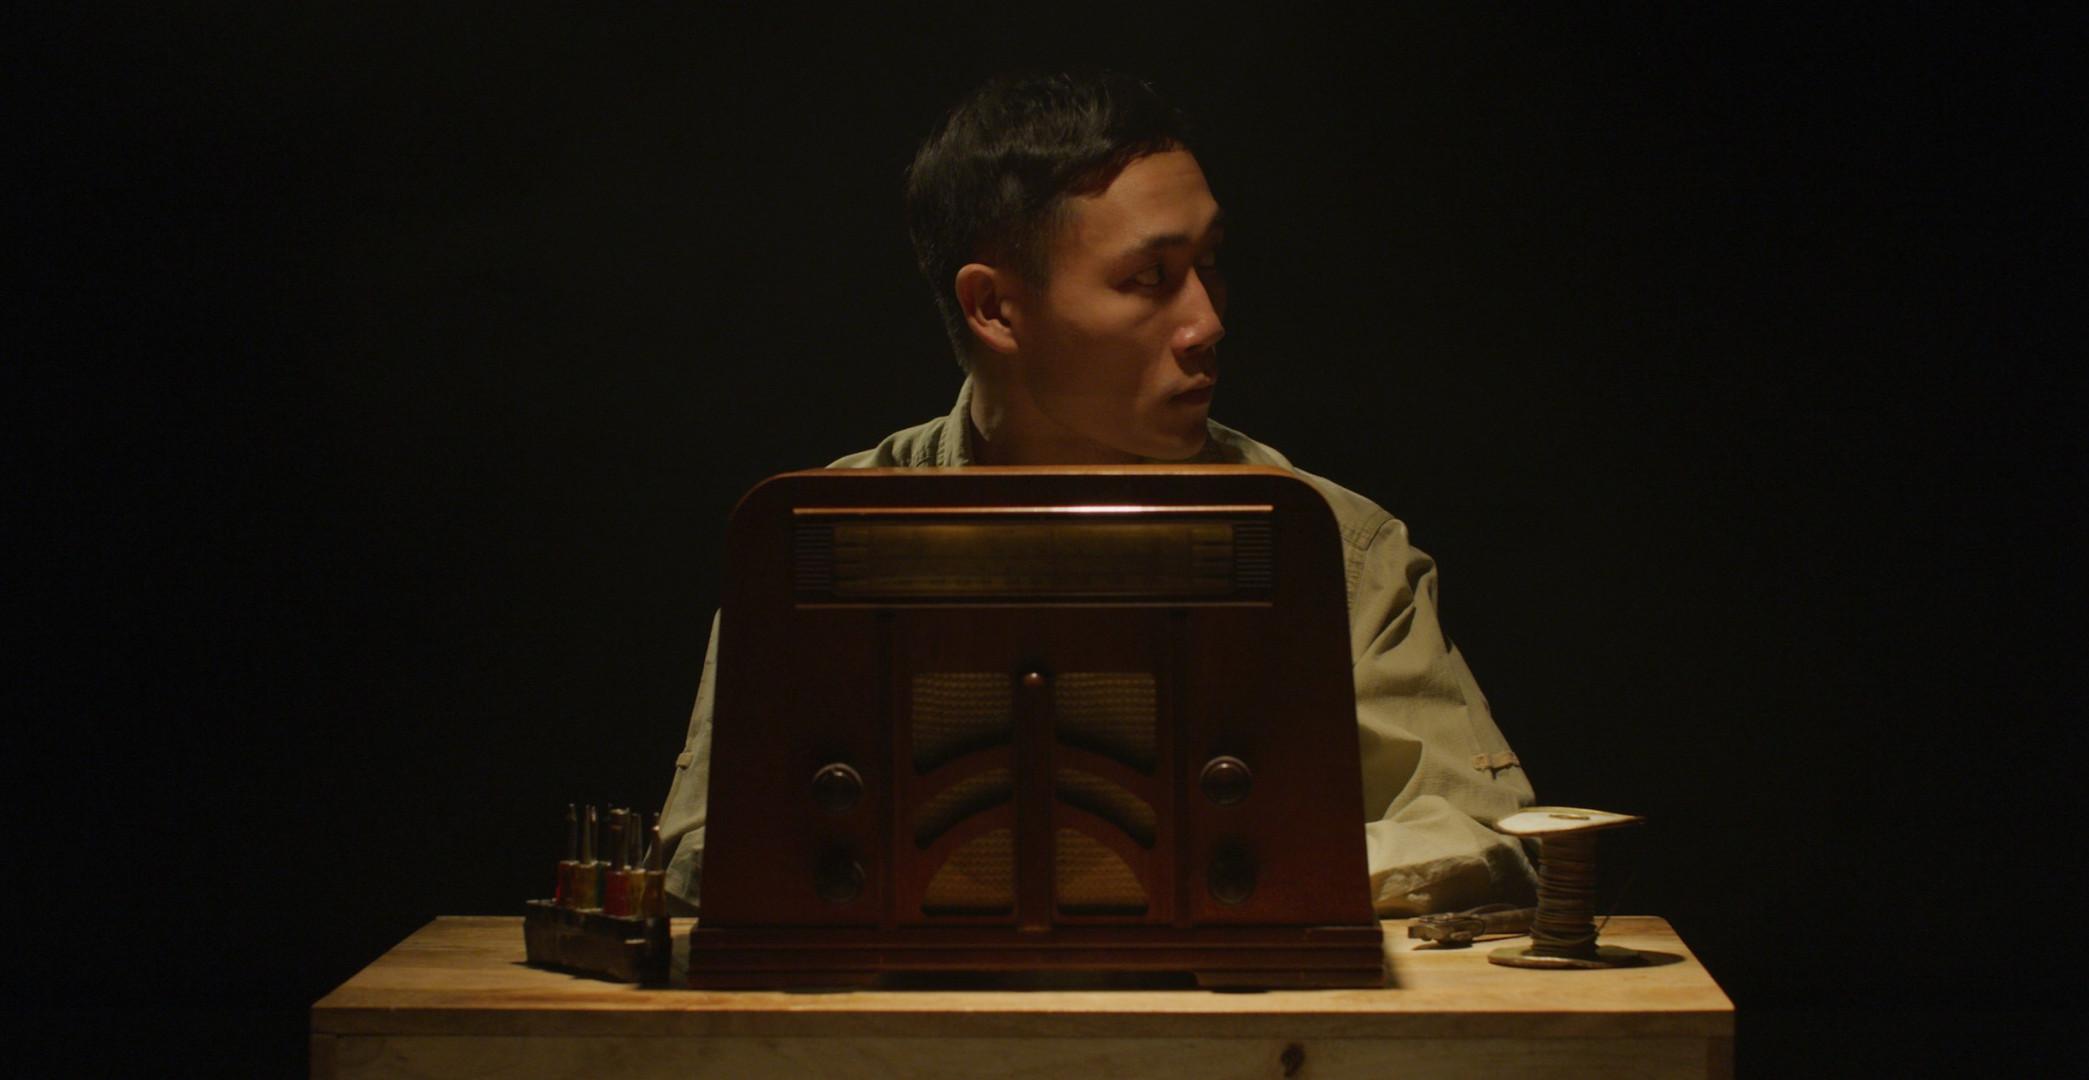 Young Shinji Mikamo fixes a shortwave radio during the WWII